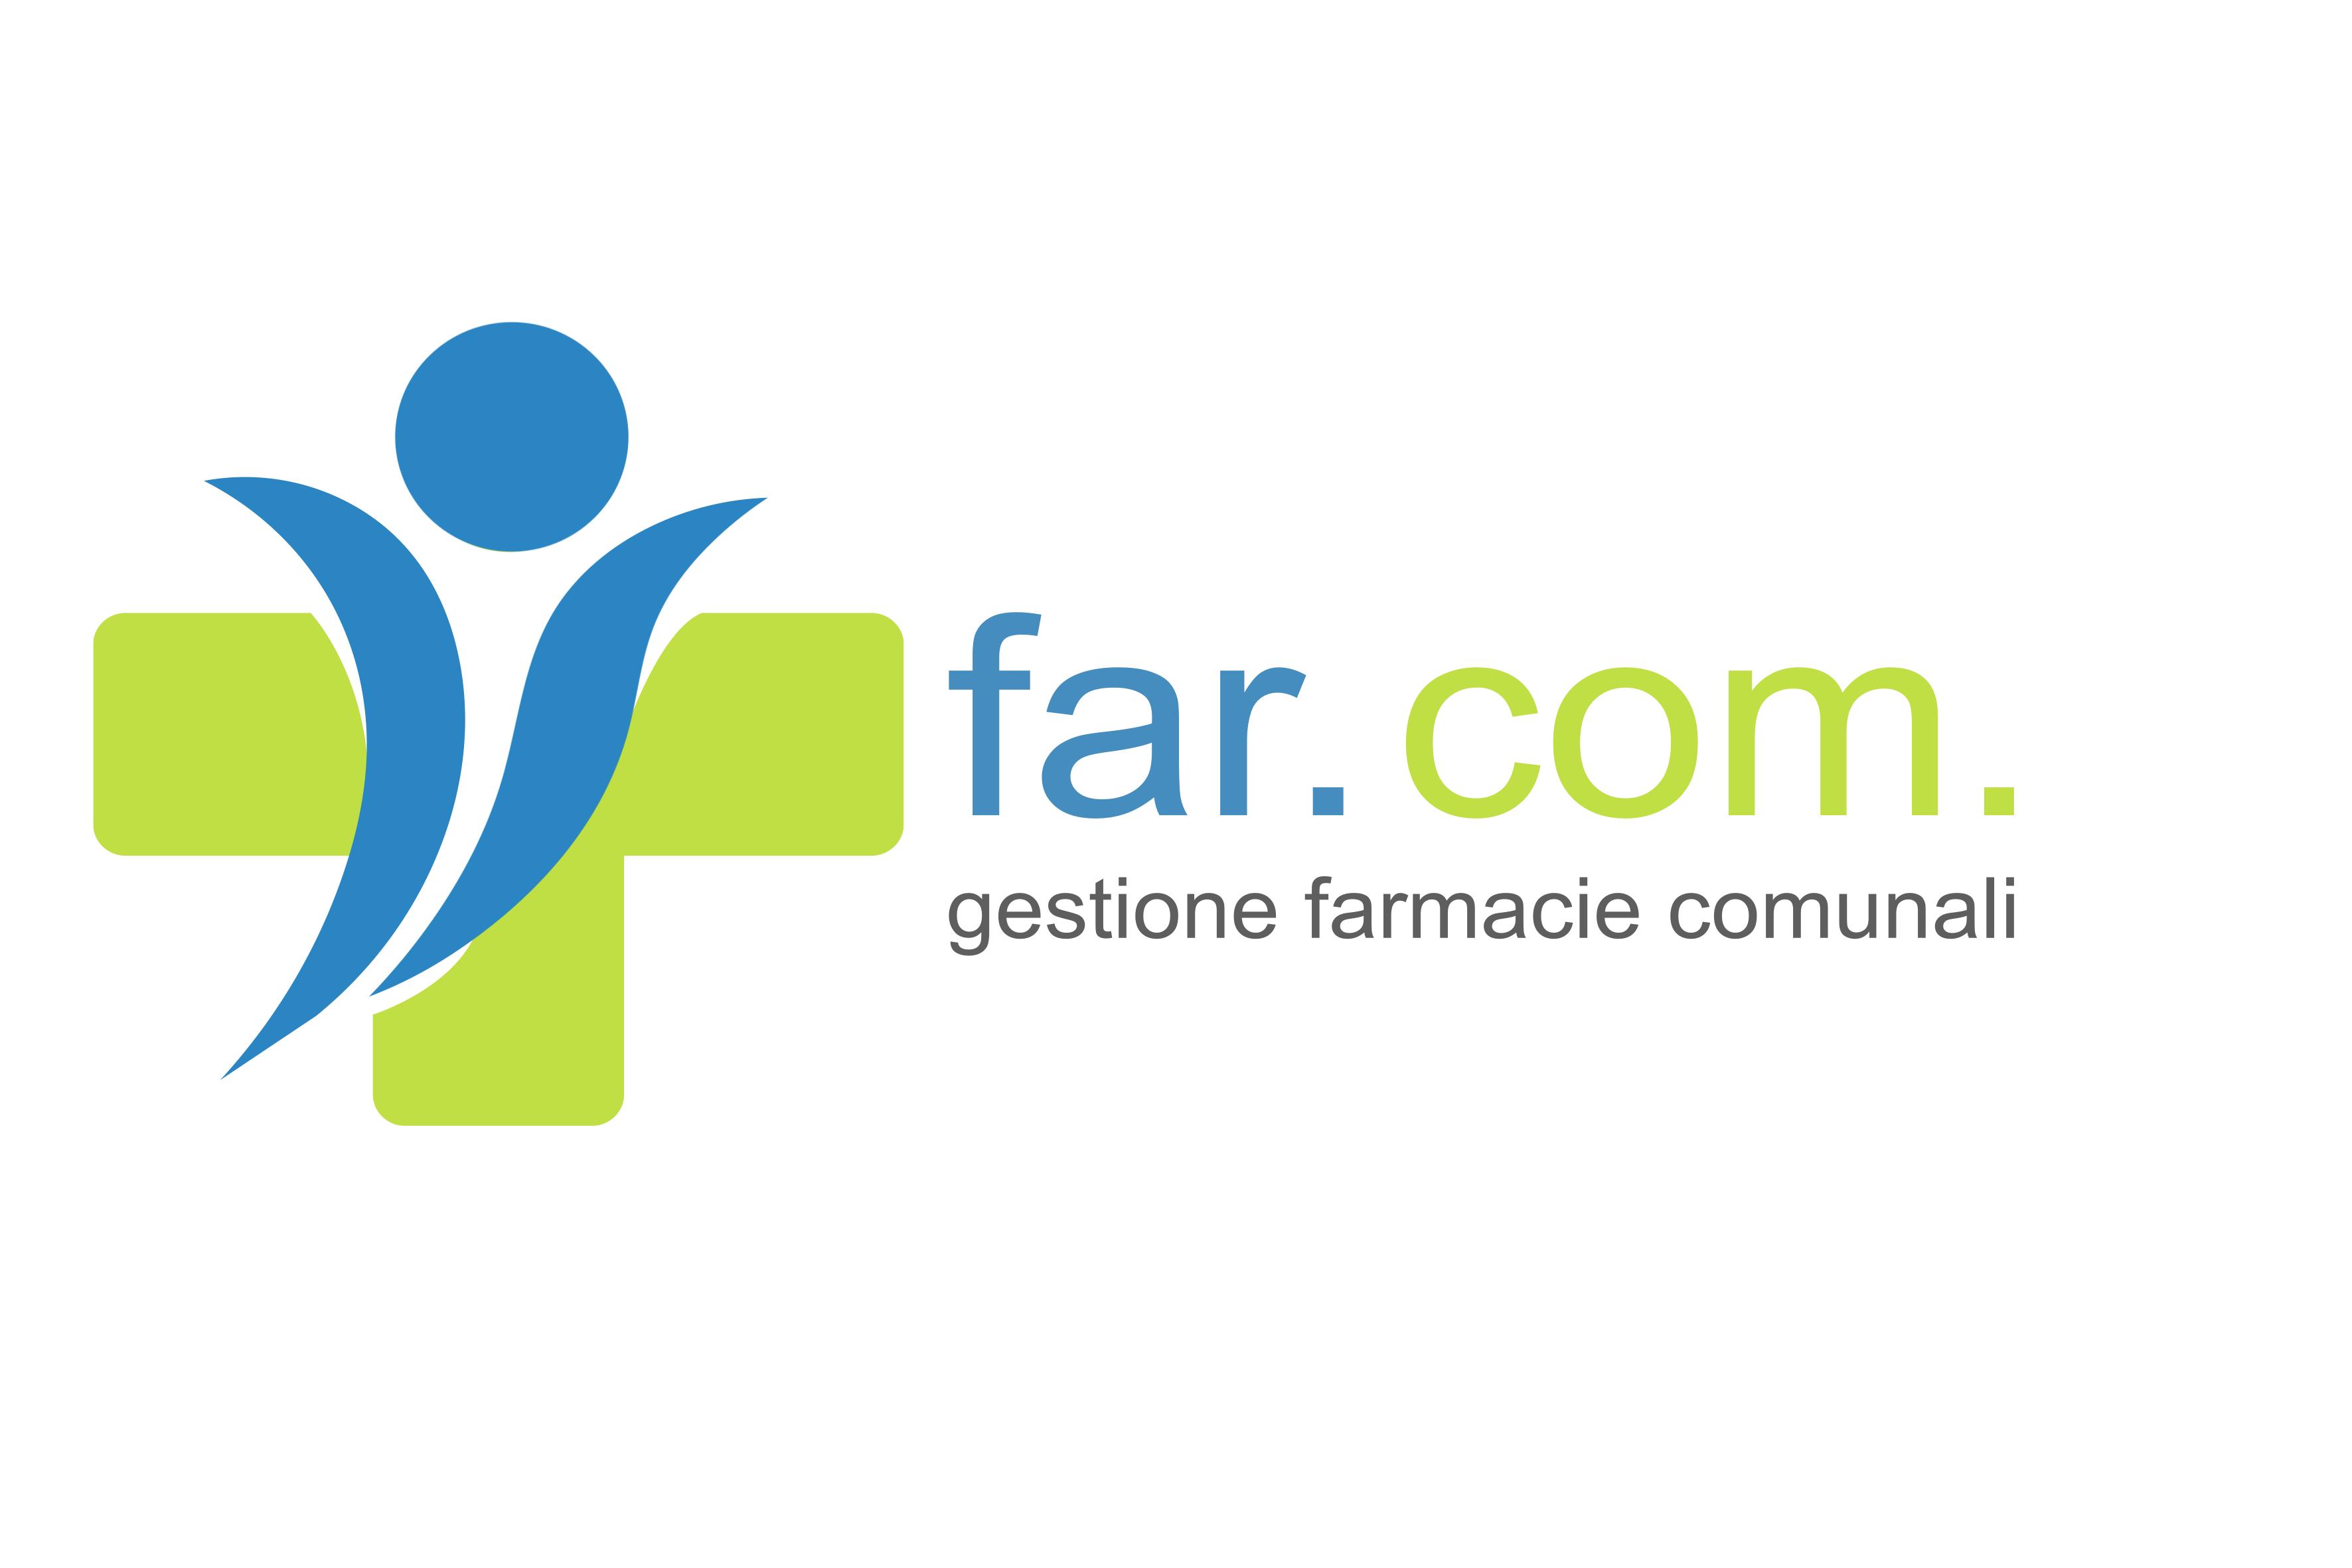 Slogan Farcom